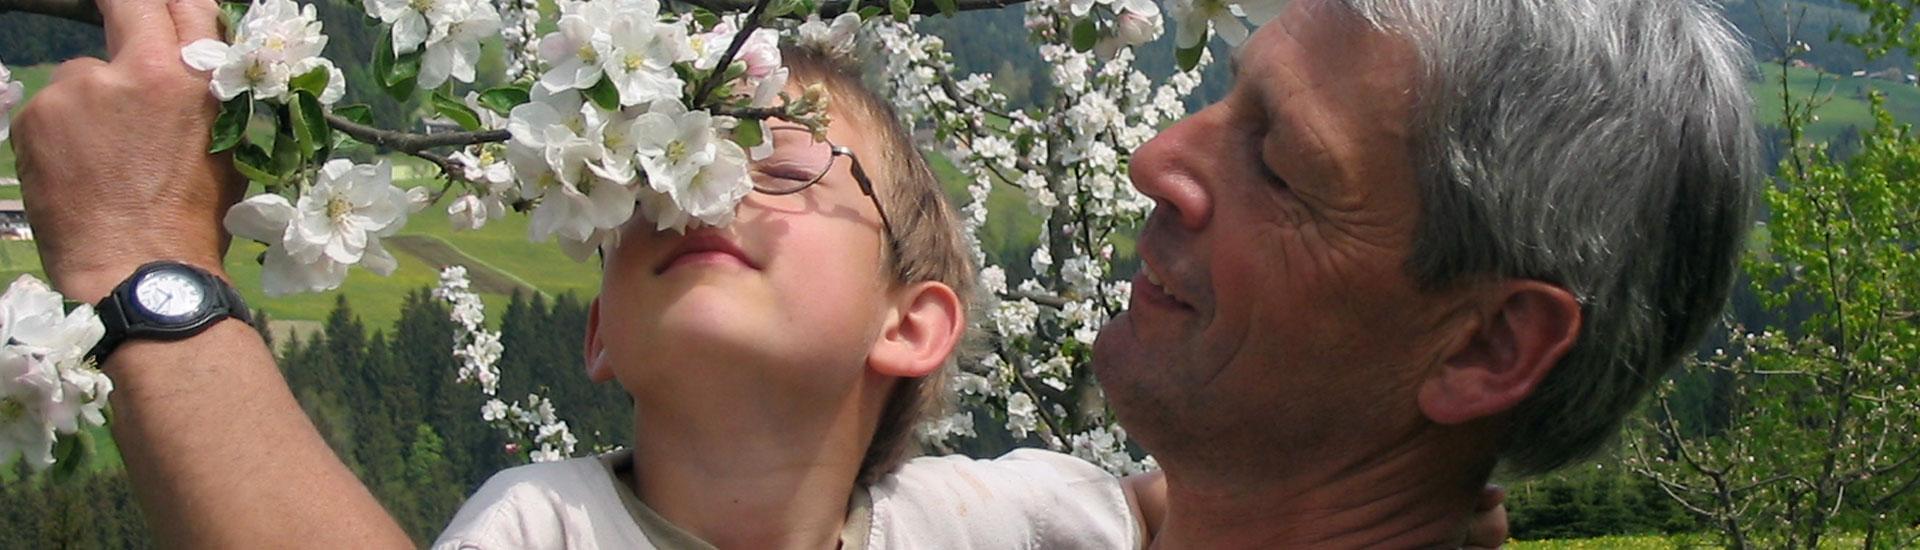 Single-Urlaub mit Kind Ajnlatok s talnyok Weerberg Fgen